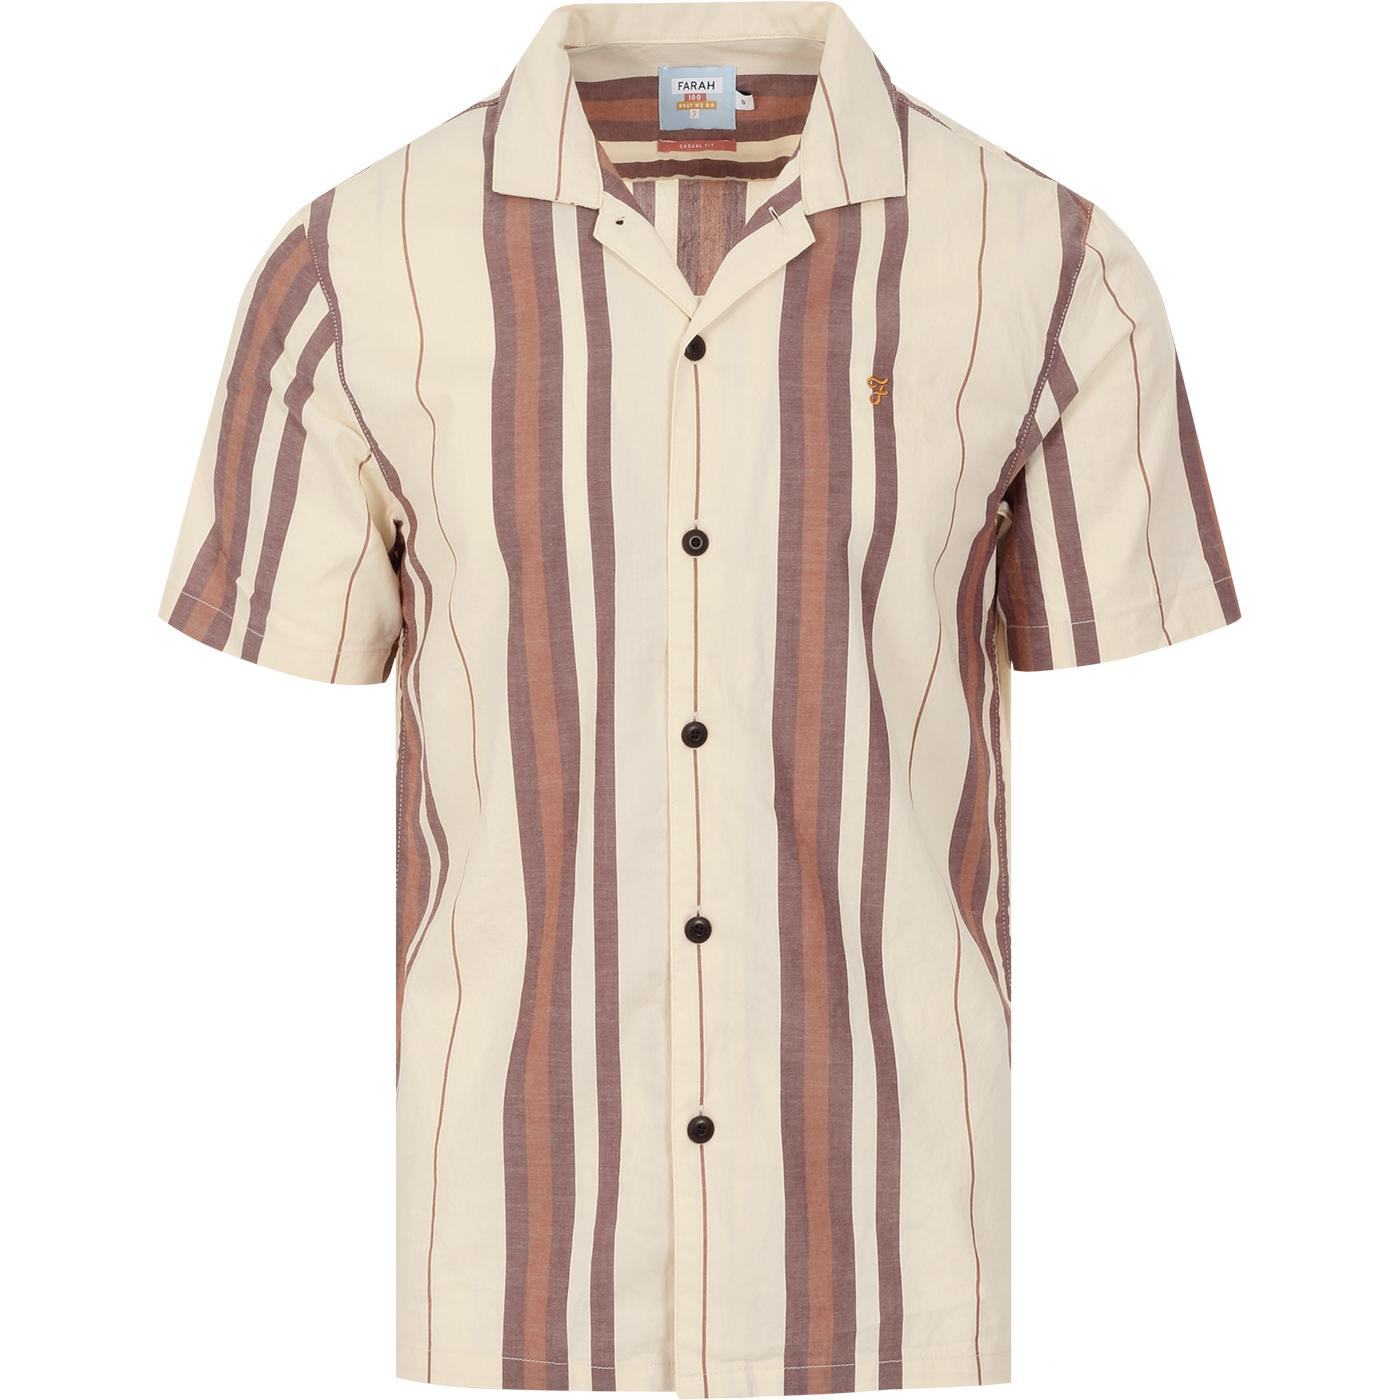 Laredo FARAH 100 Retro Stripe Cuban Collar Shirt C